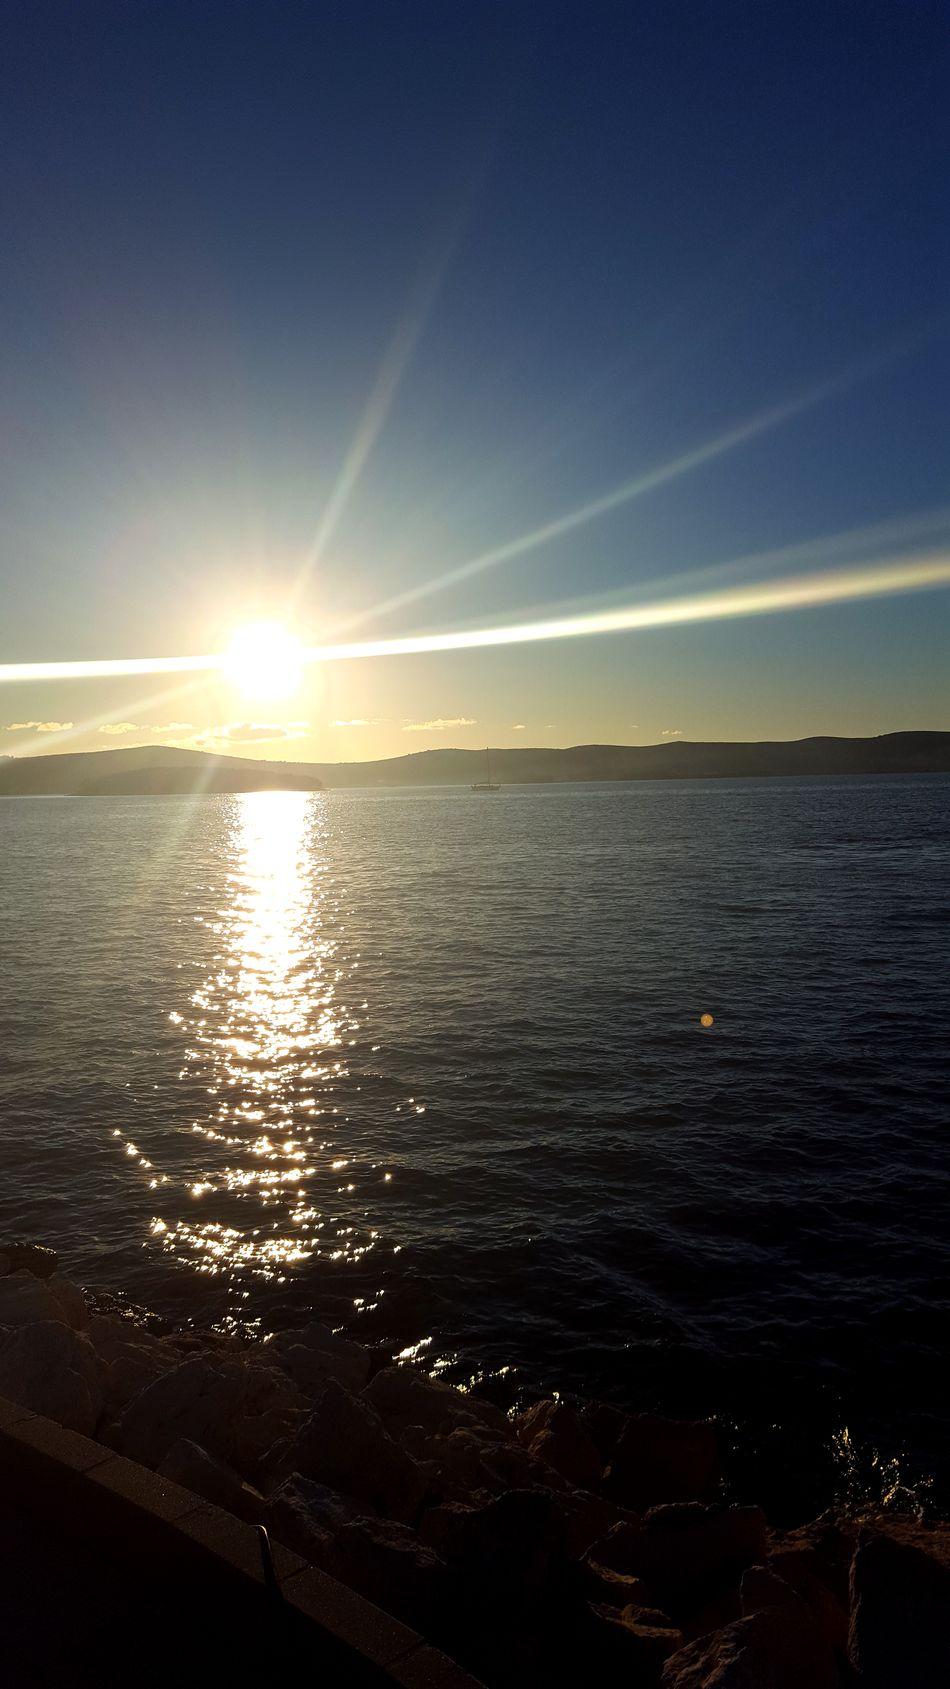 Reflection Sunlight Beauty In Nature Sea Horizon Over Water Nature Sunset Scenics Sky Water Sunbeam Outdoors No People Astronomy Sun Day Sunlight